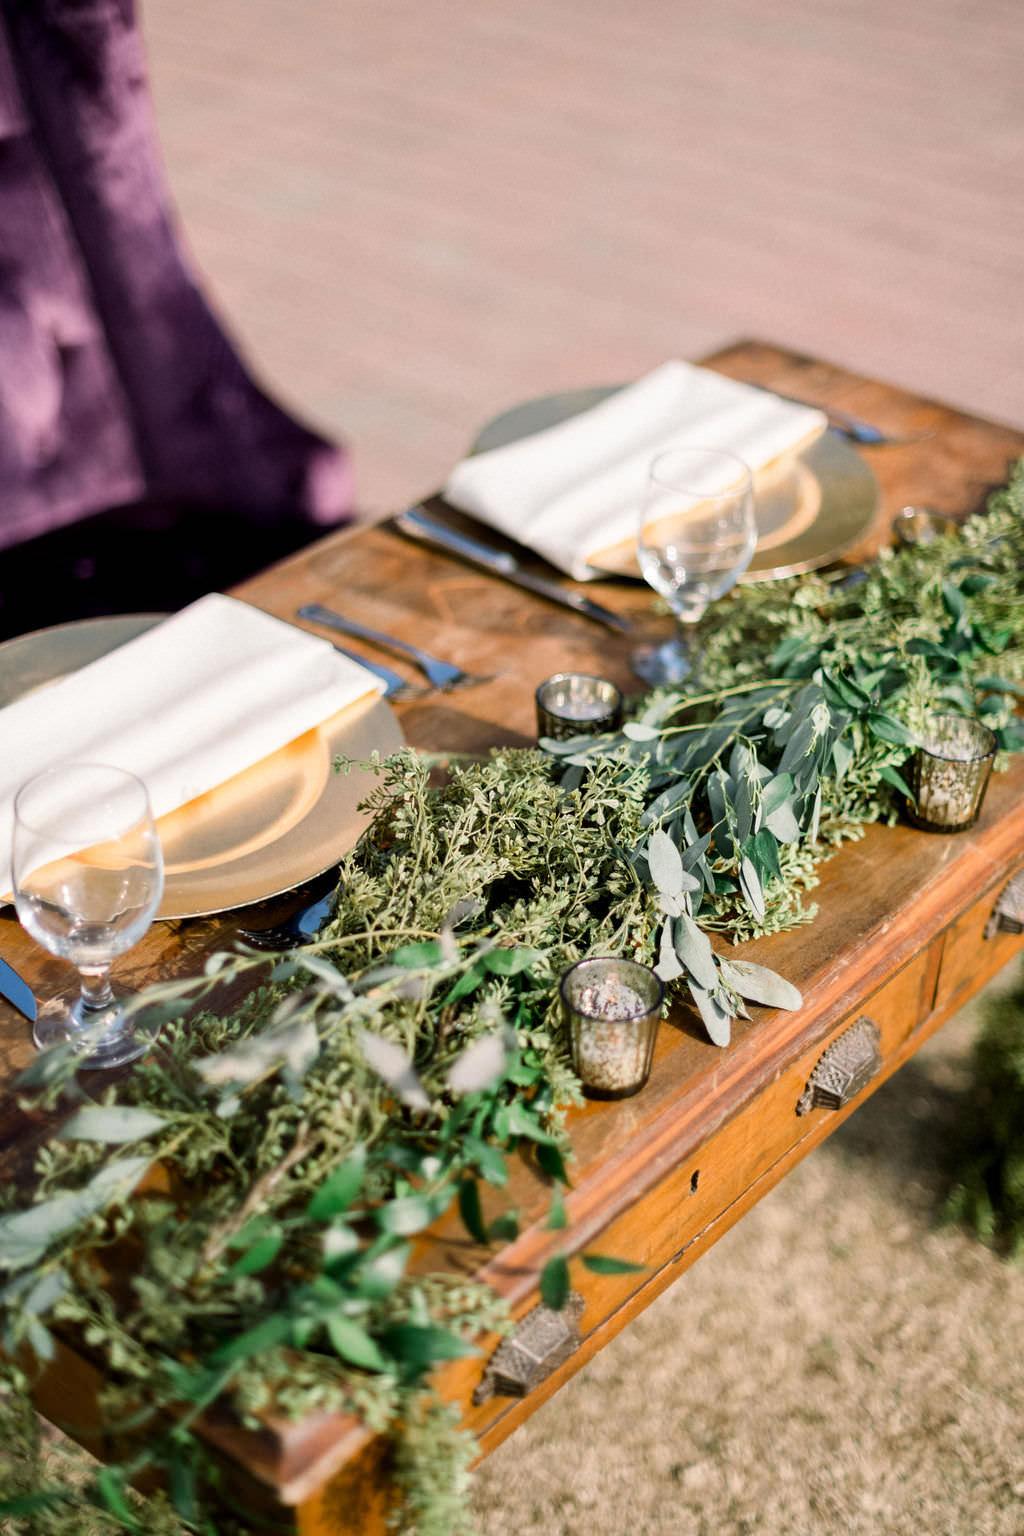 Elegant, Vintage Inspired Wedding Decor, Wooden Desk Sweetheart Table, With Greenery Garland | Sarasota Wedding Planner Laura Detwiler Events